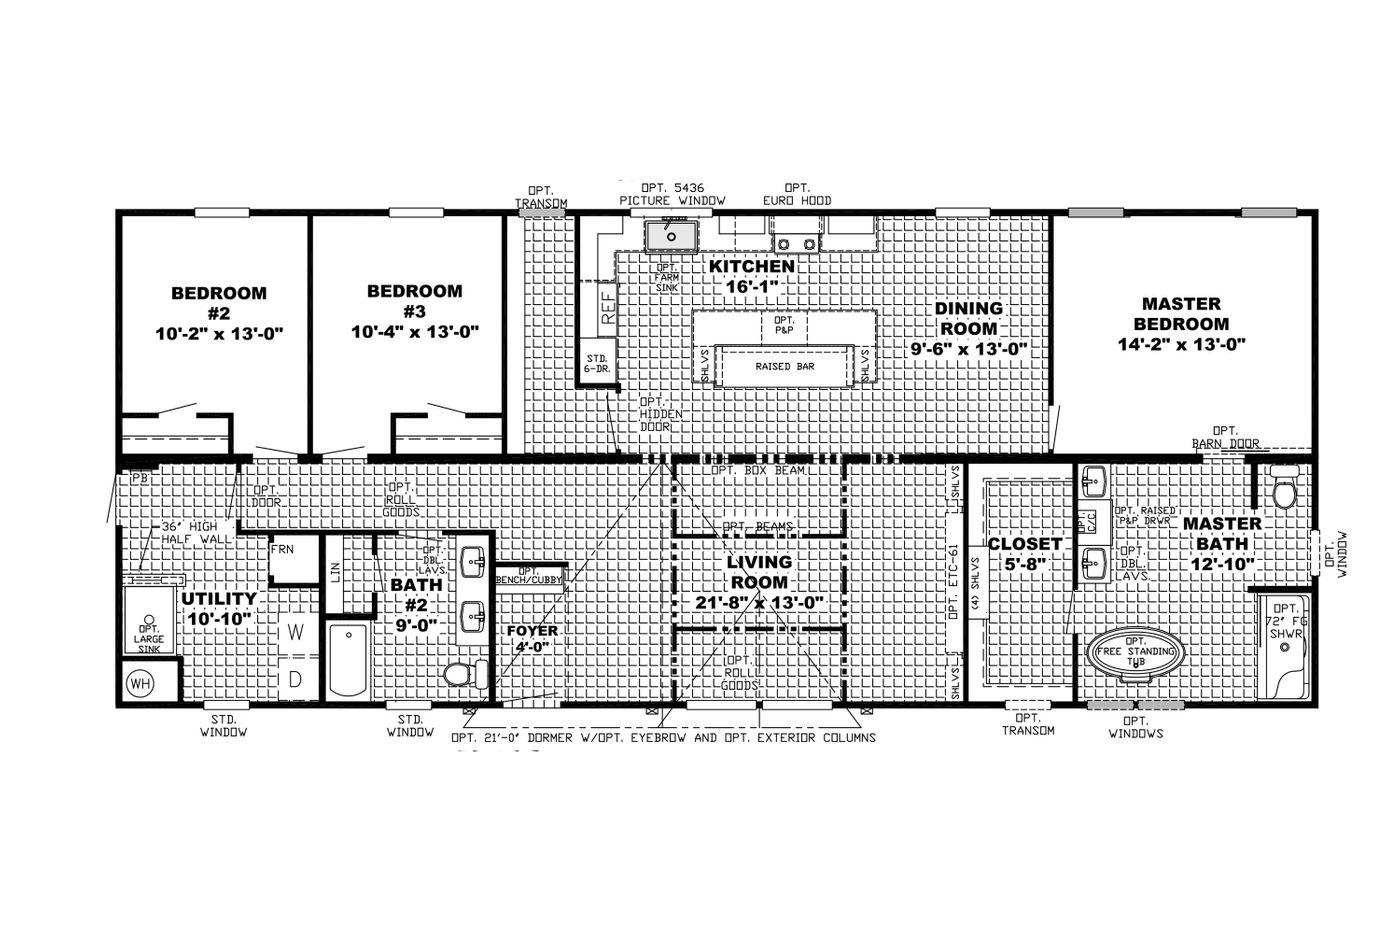 The Shoreline Floorplan